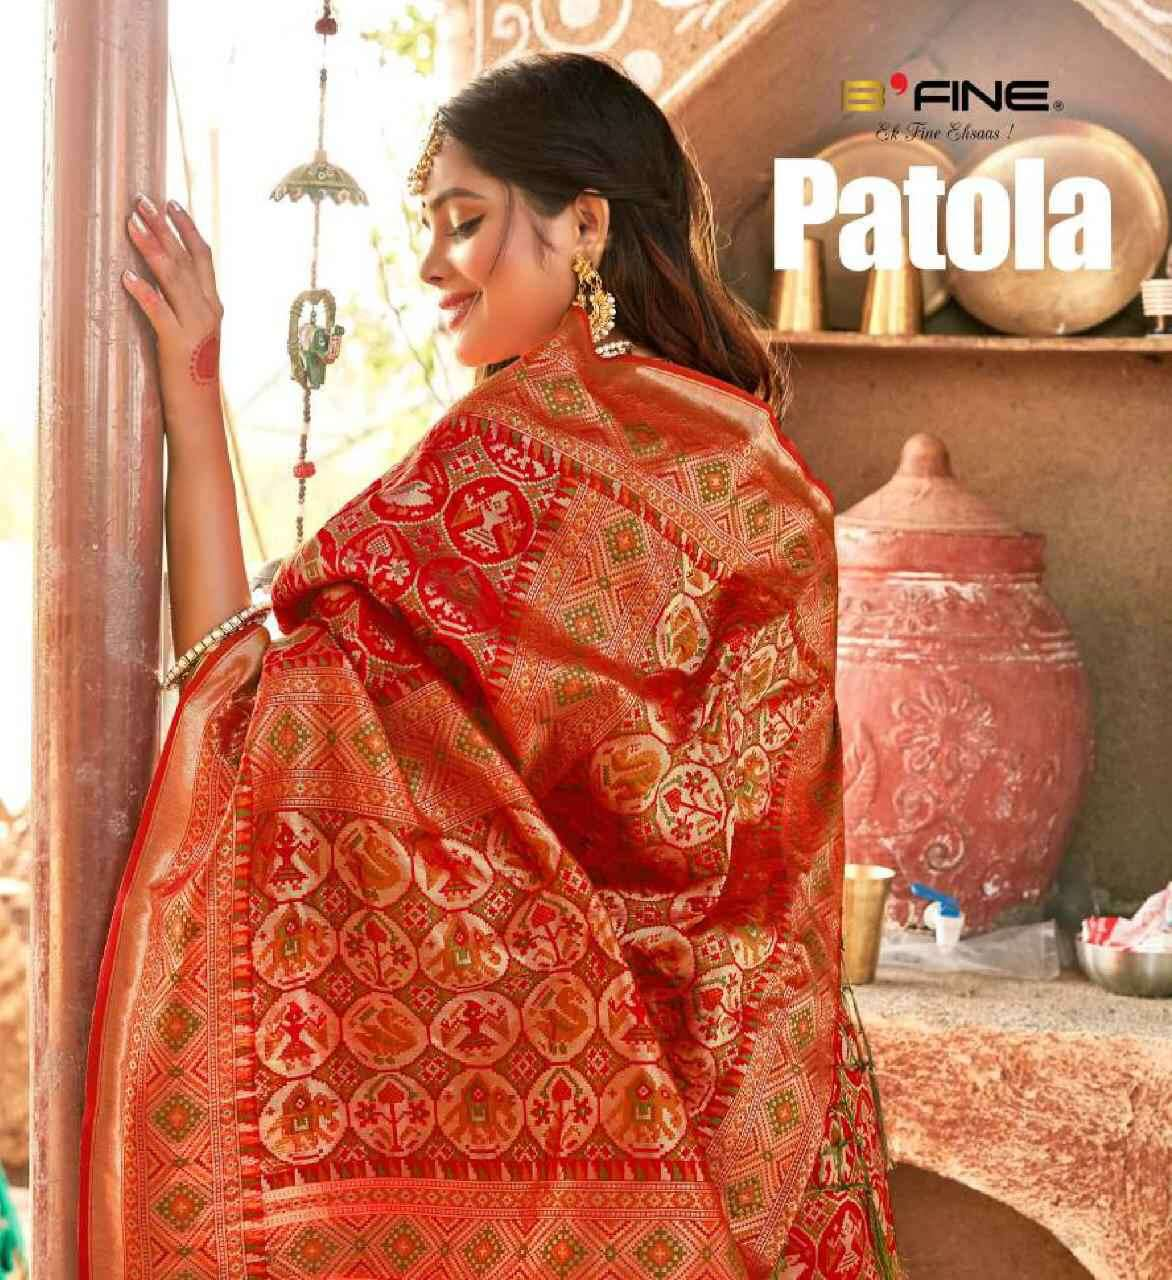 B Fine Patola Exclusive Banarasi Silk Saree New Designs in Wholesale Price